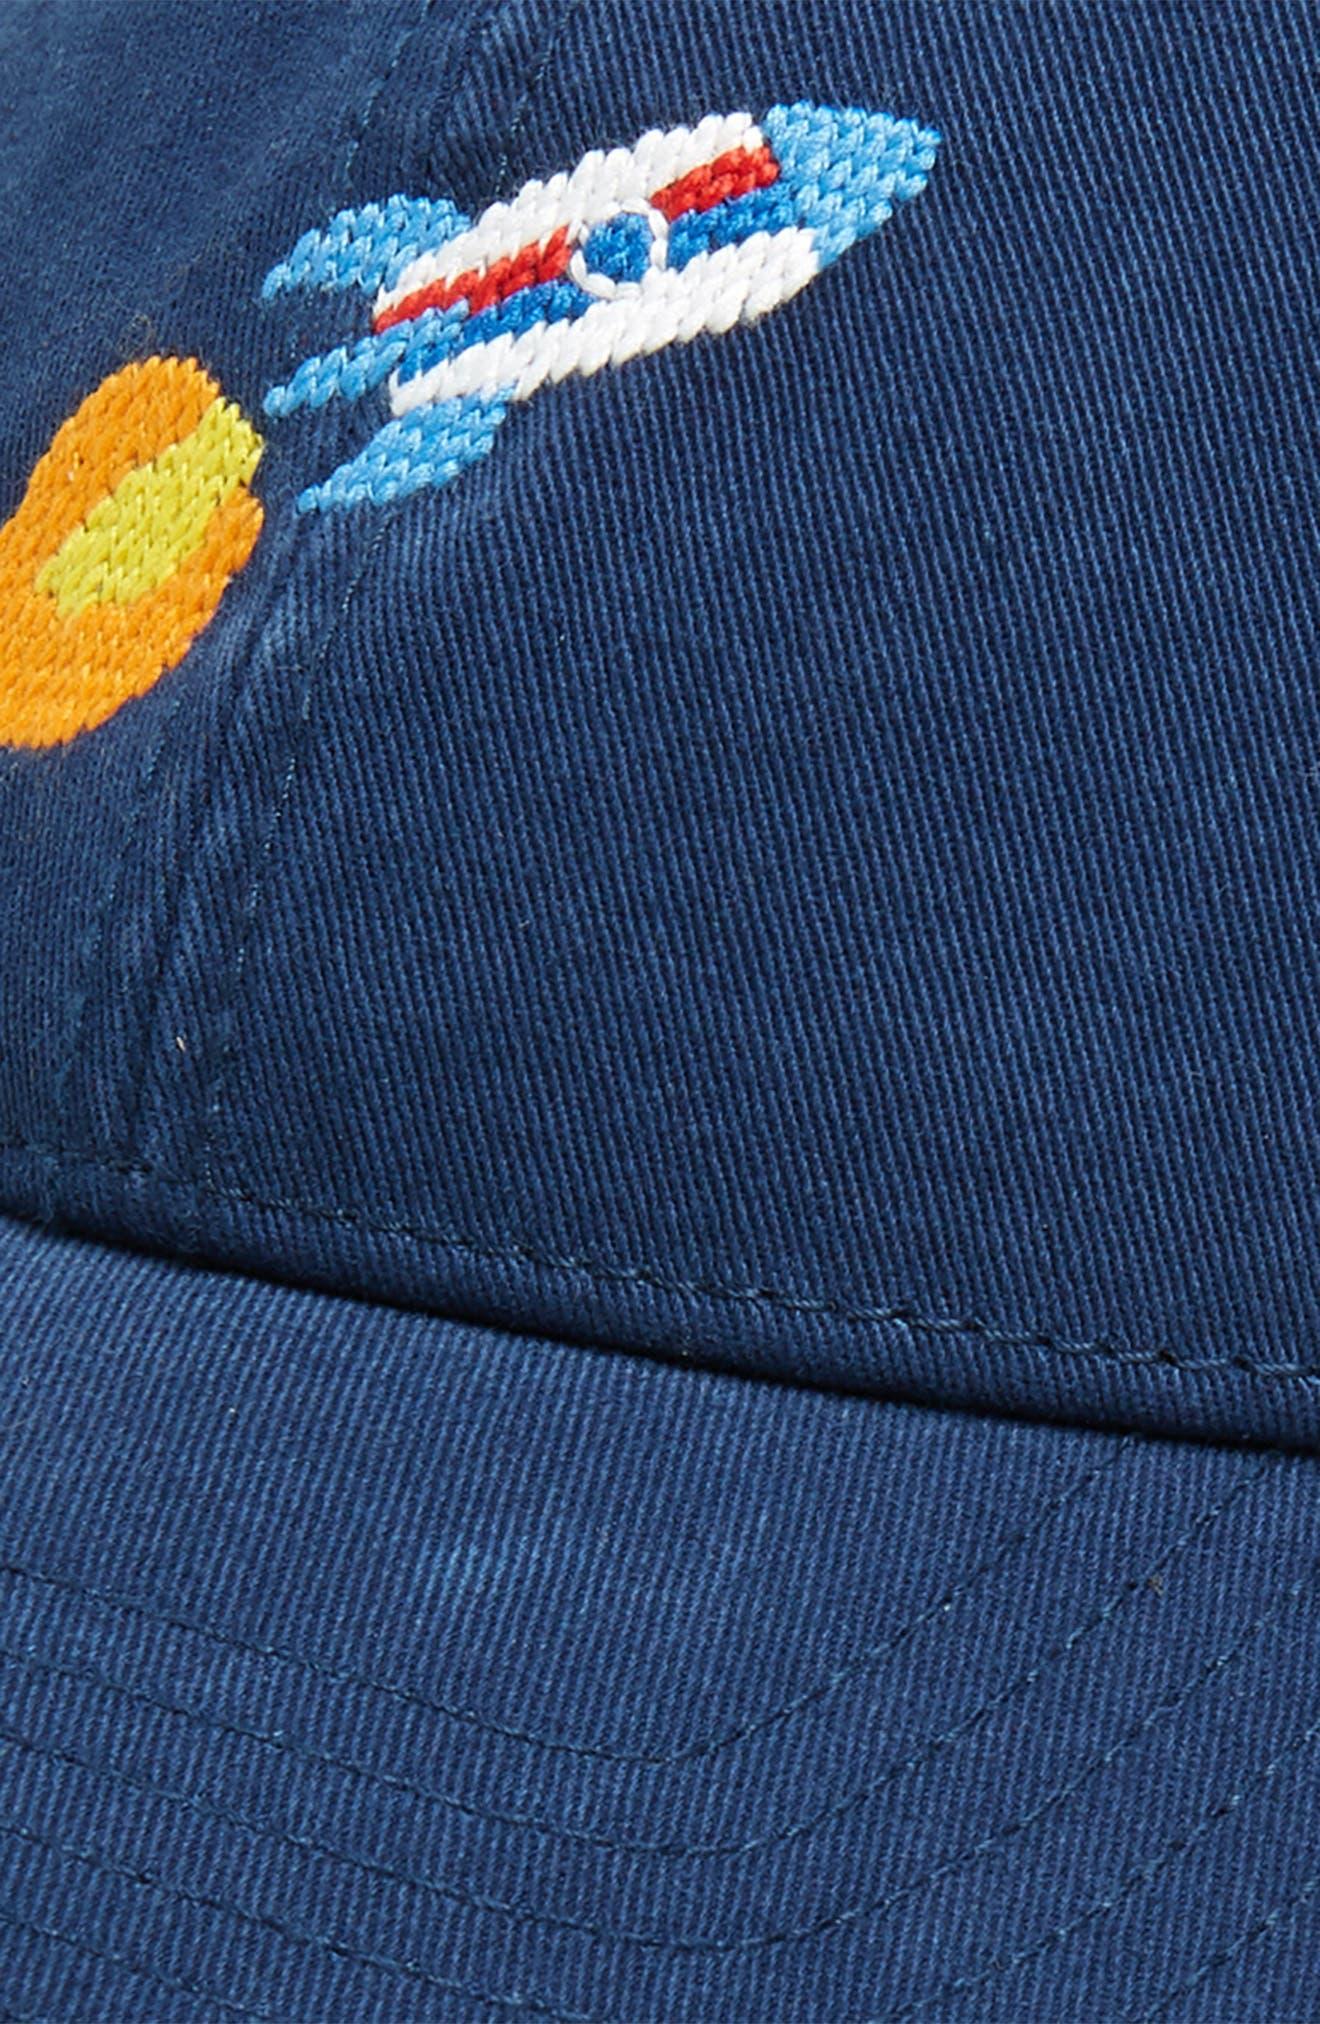 Rocket Baseball Cap,                             Alternate thumbnail 3, color,                             NAVY